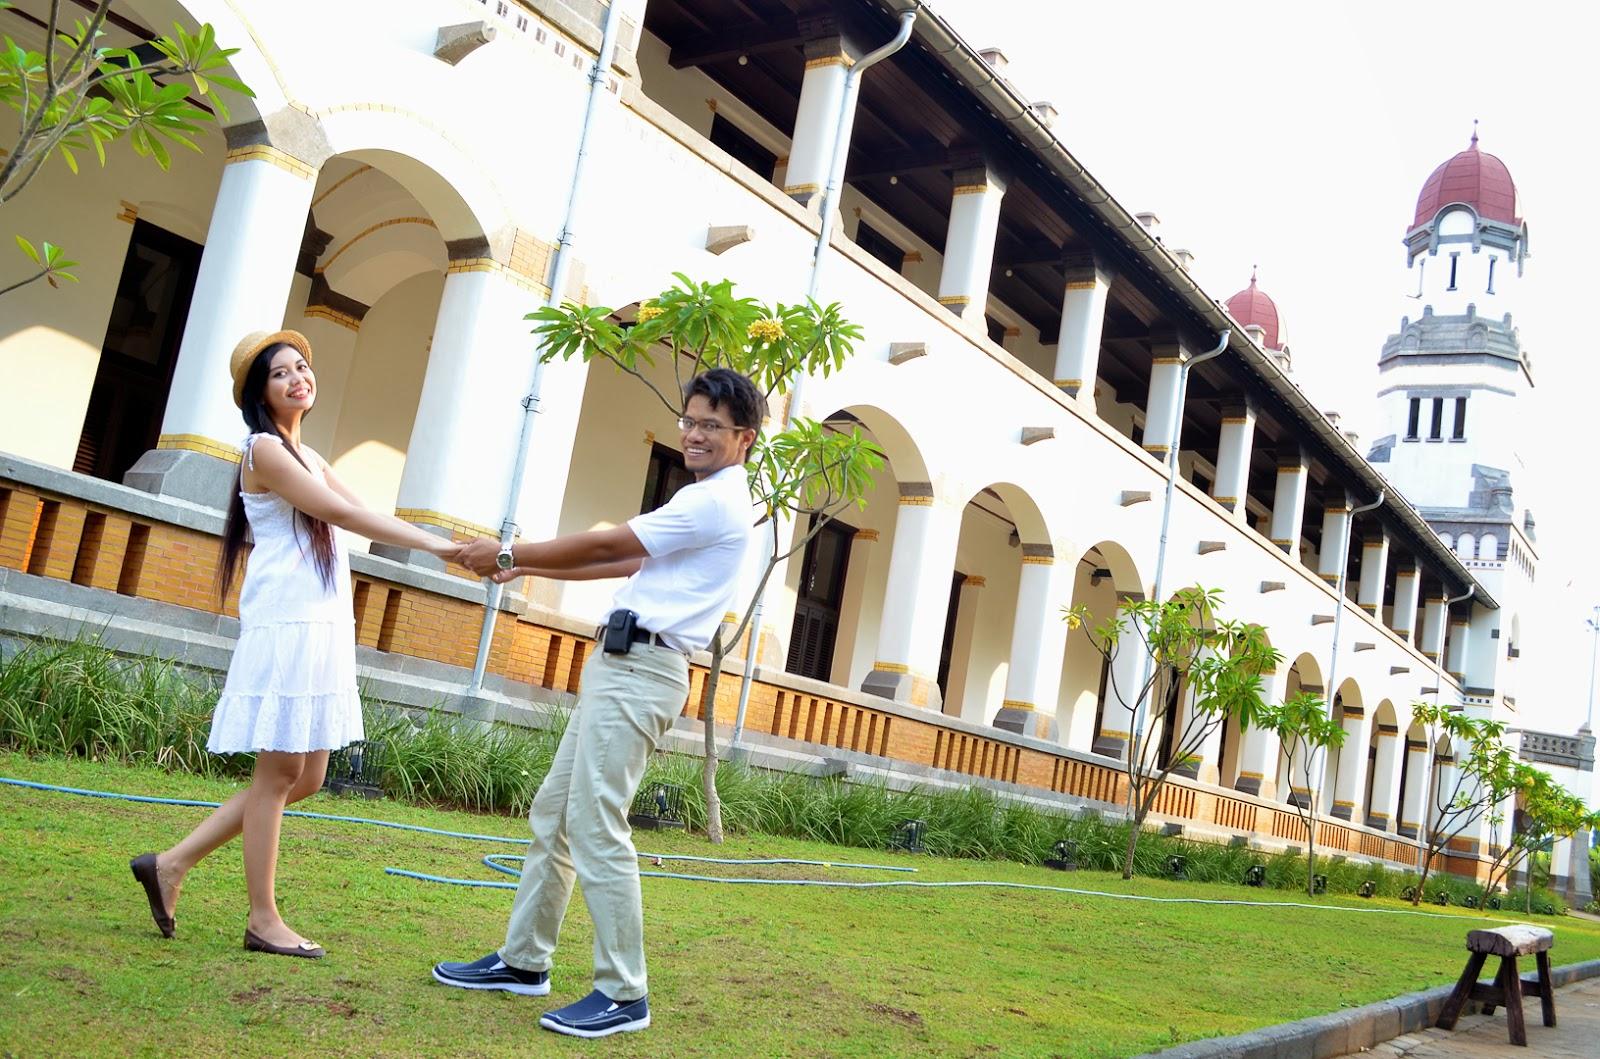 Kunjungi 10 Tempat Keren Foto Pre Wedding Semarang Lawang Sewu